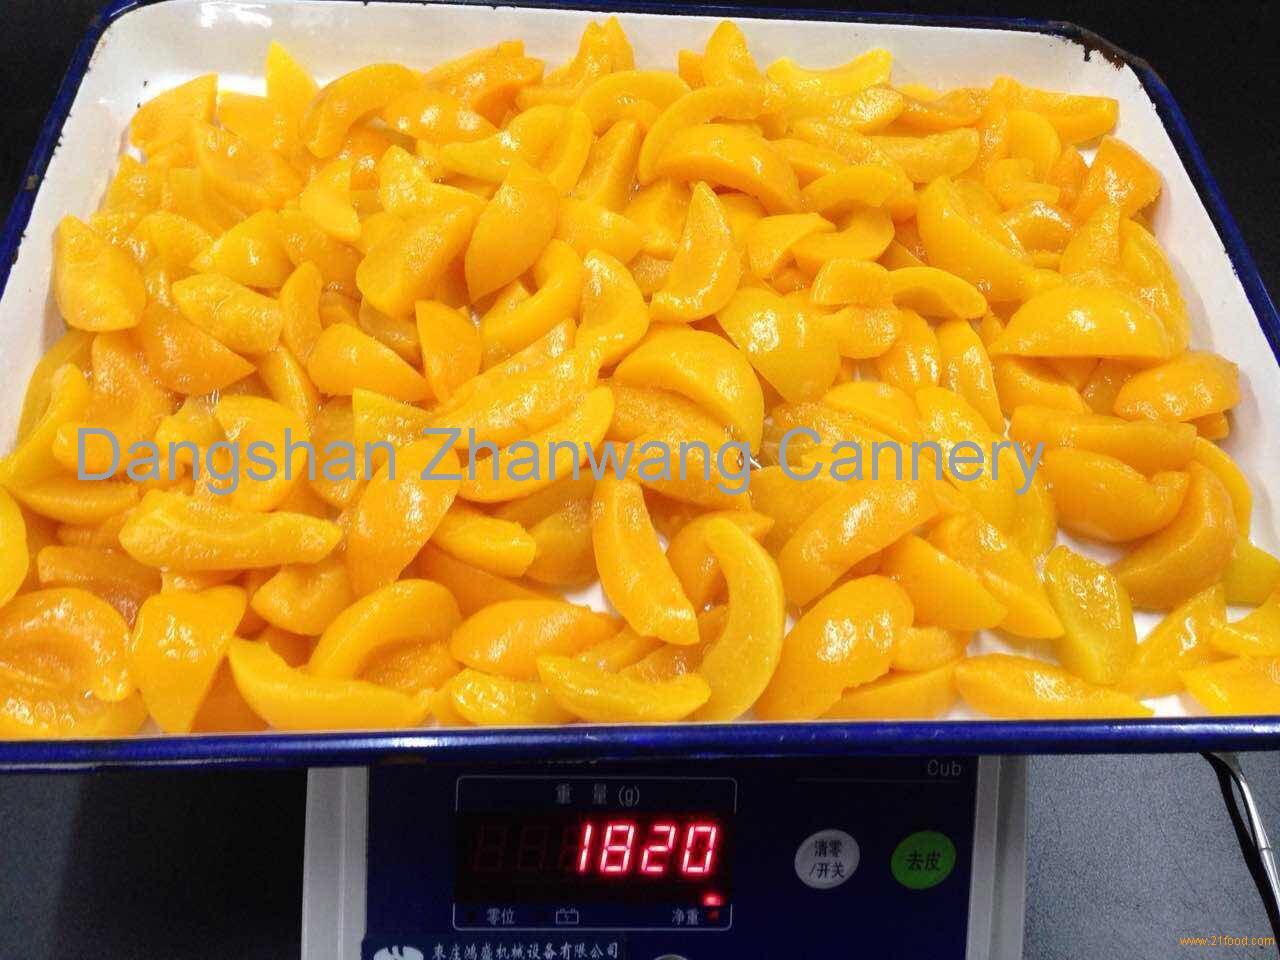 Yellow Peach Slice